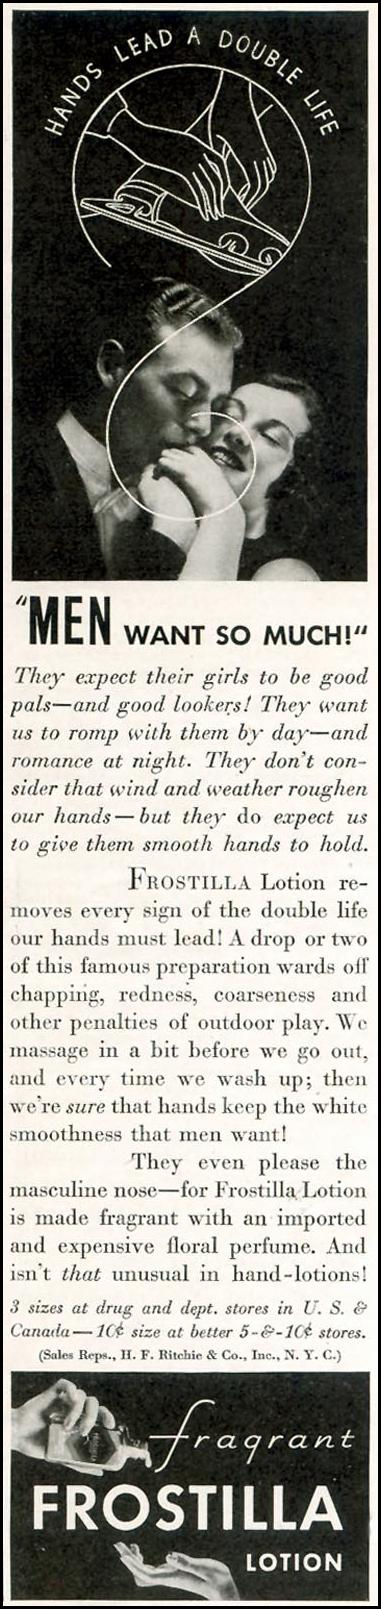 FROSTILLA LOTION GOOD HOUSEKEEPING 11/01/1933 p. 226